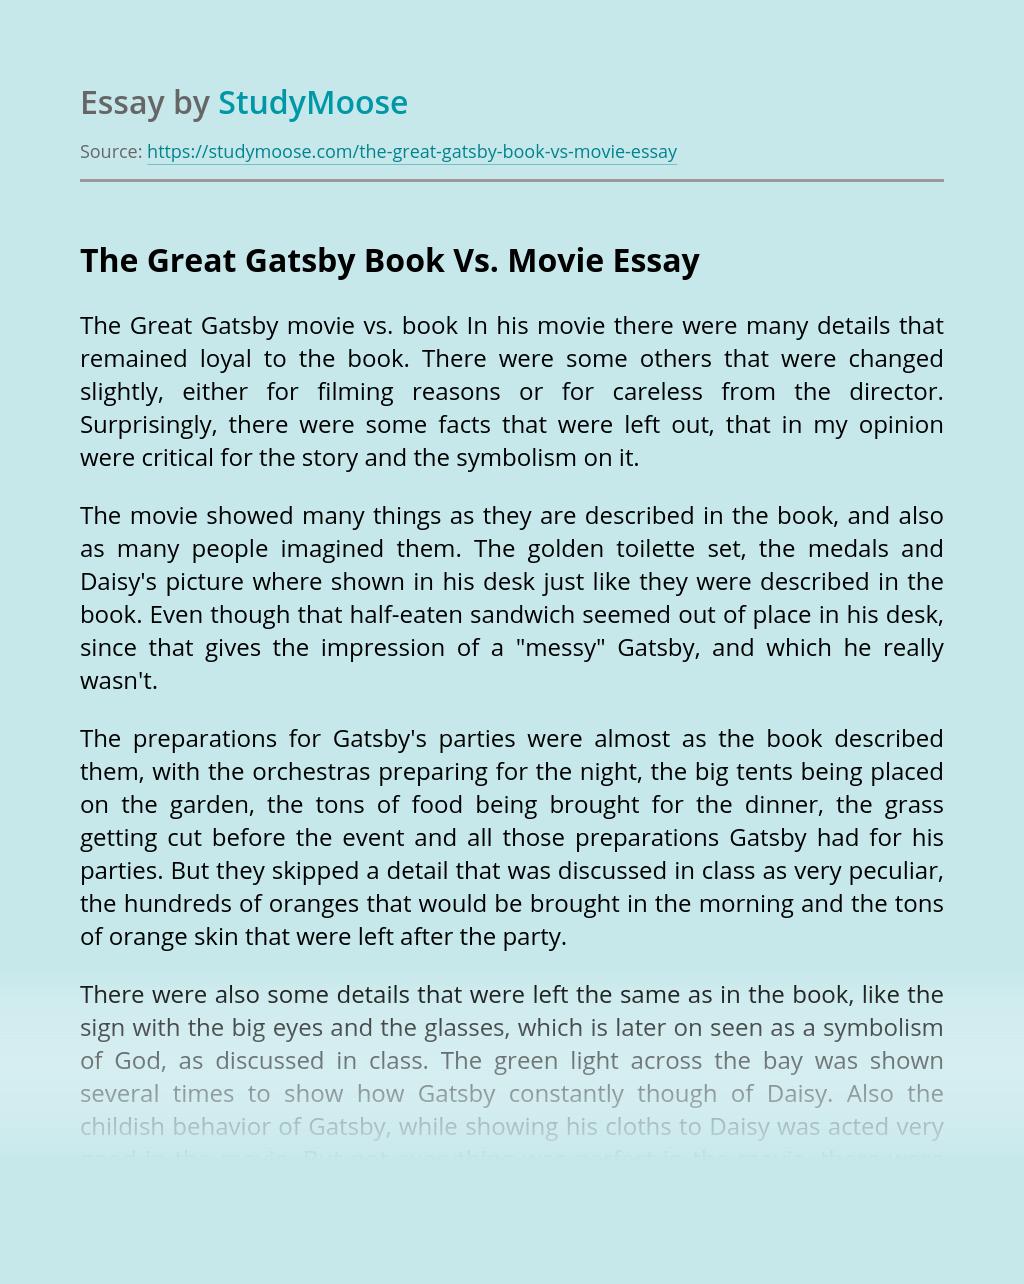 The Great Gatsby Book Vs. Movie